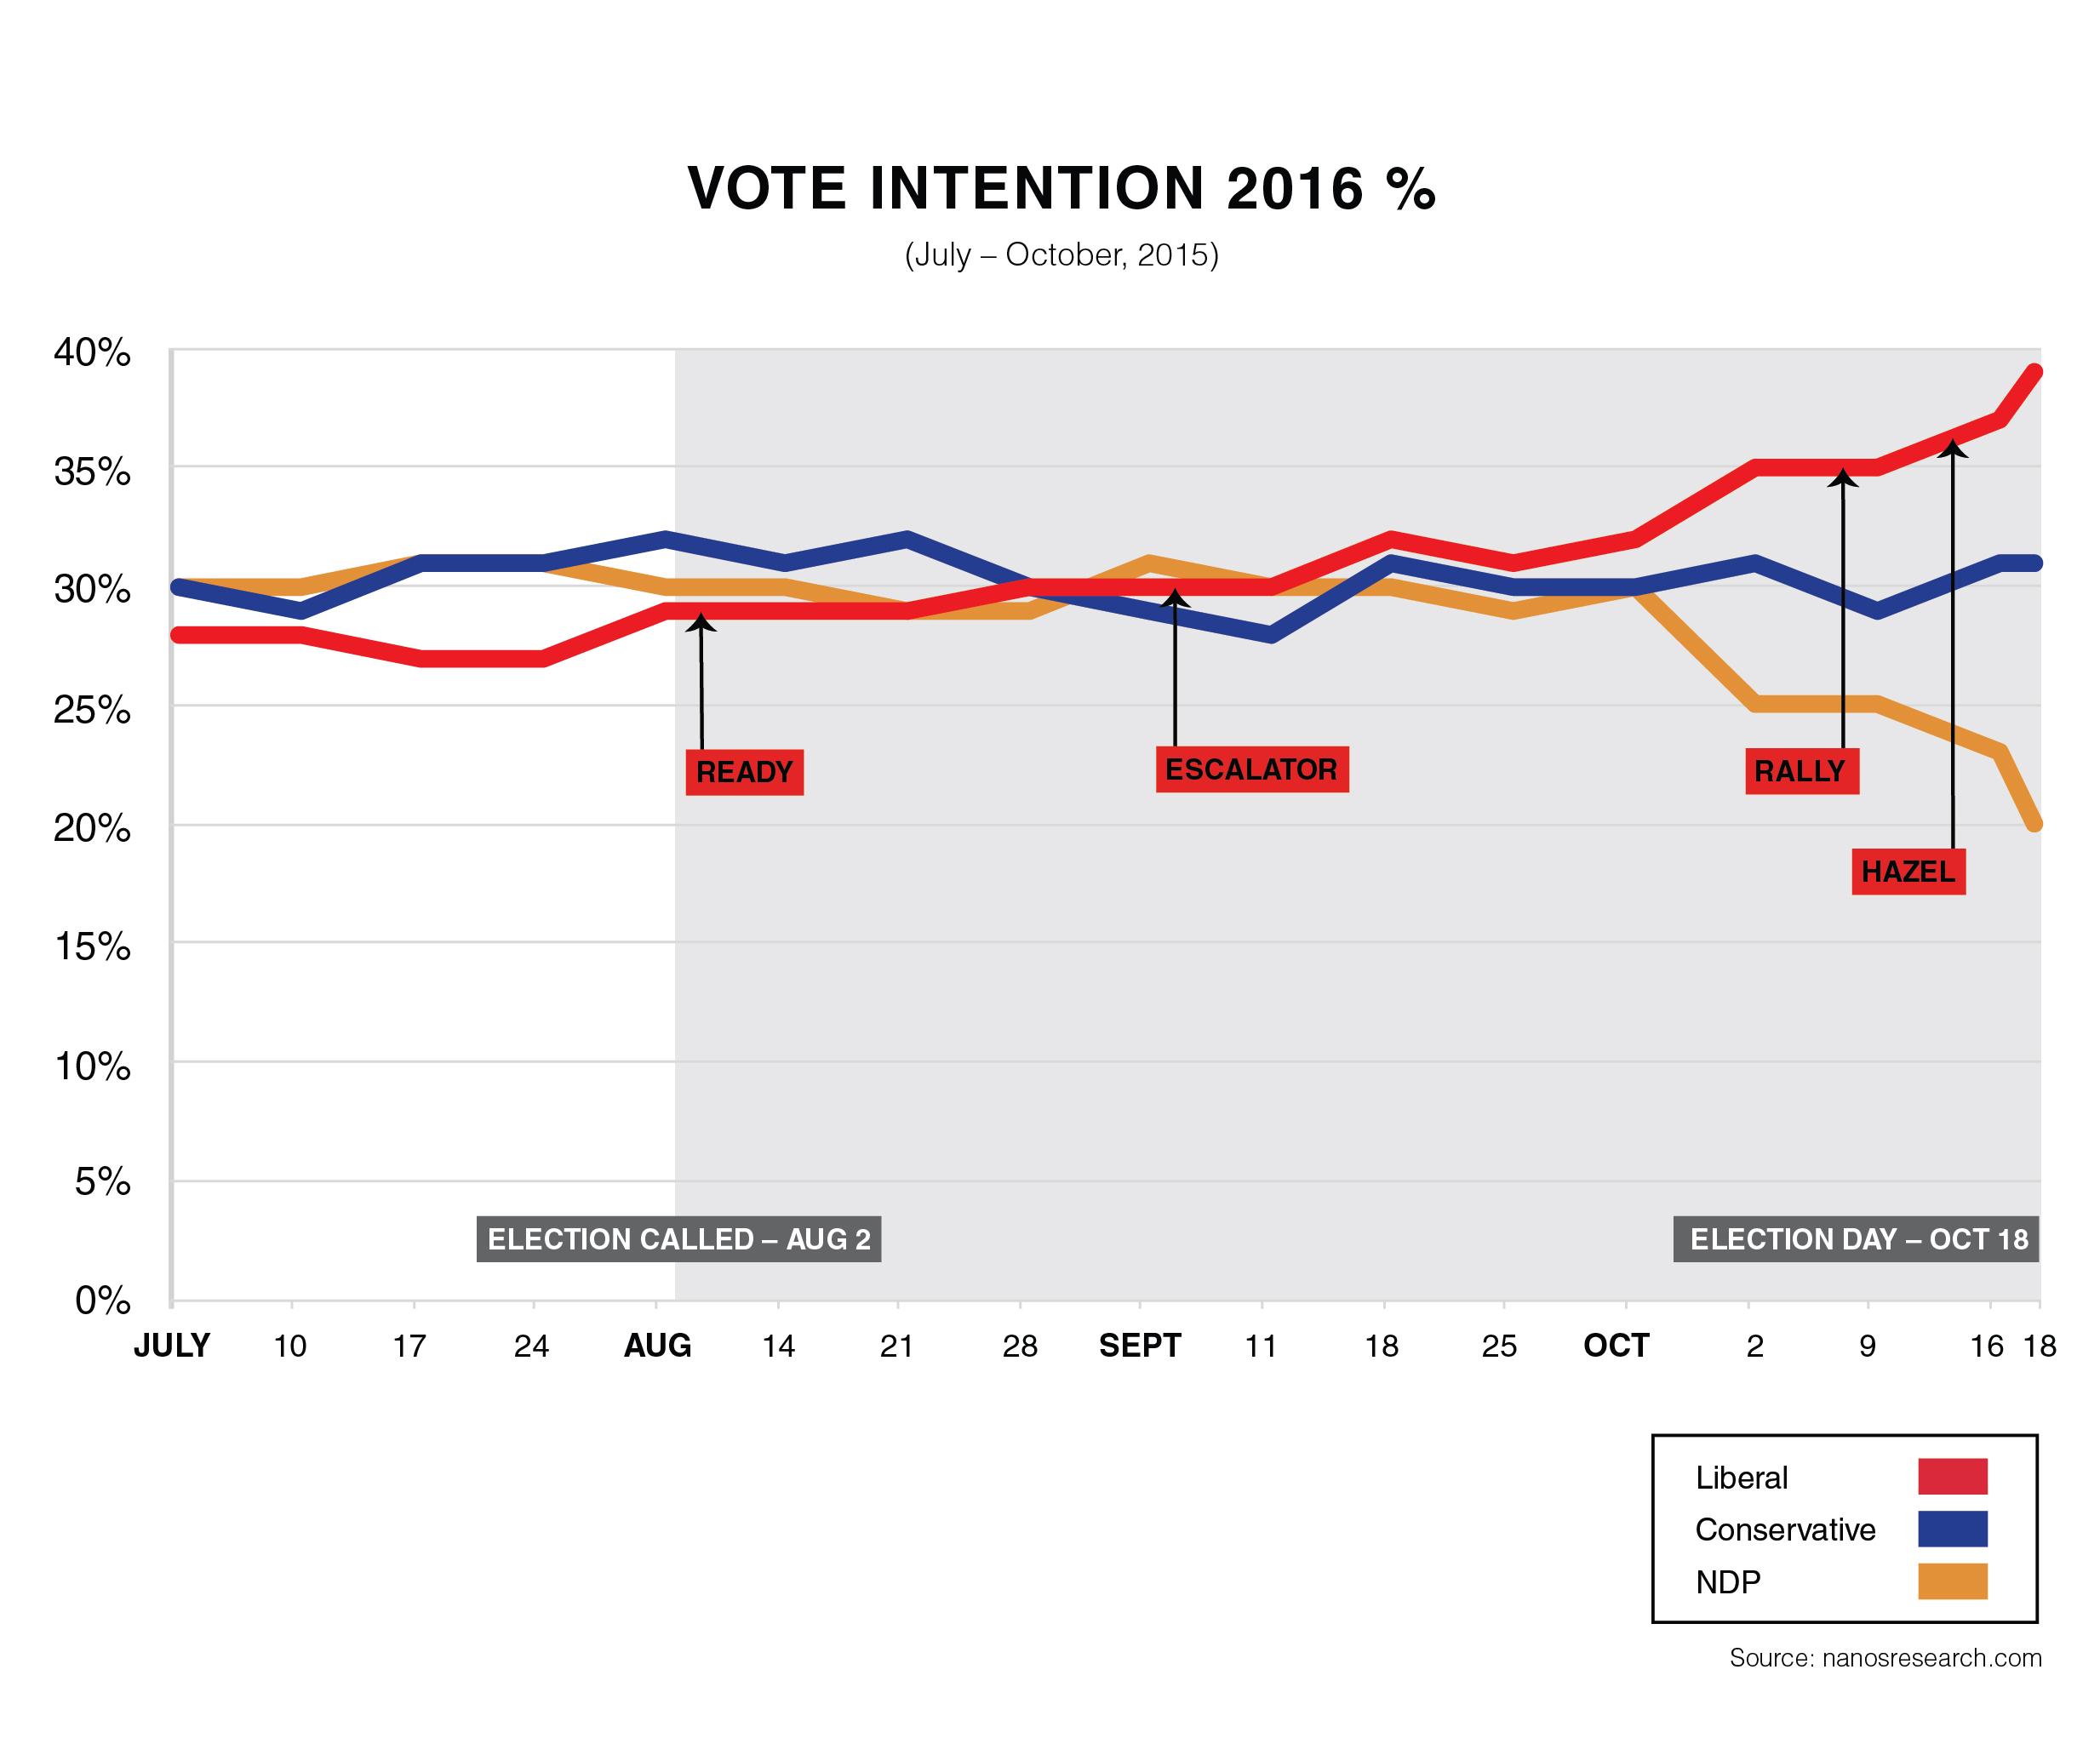 34084_VoteIntention2016_Tags